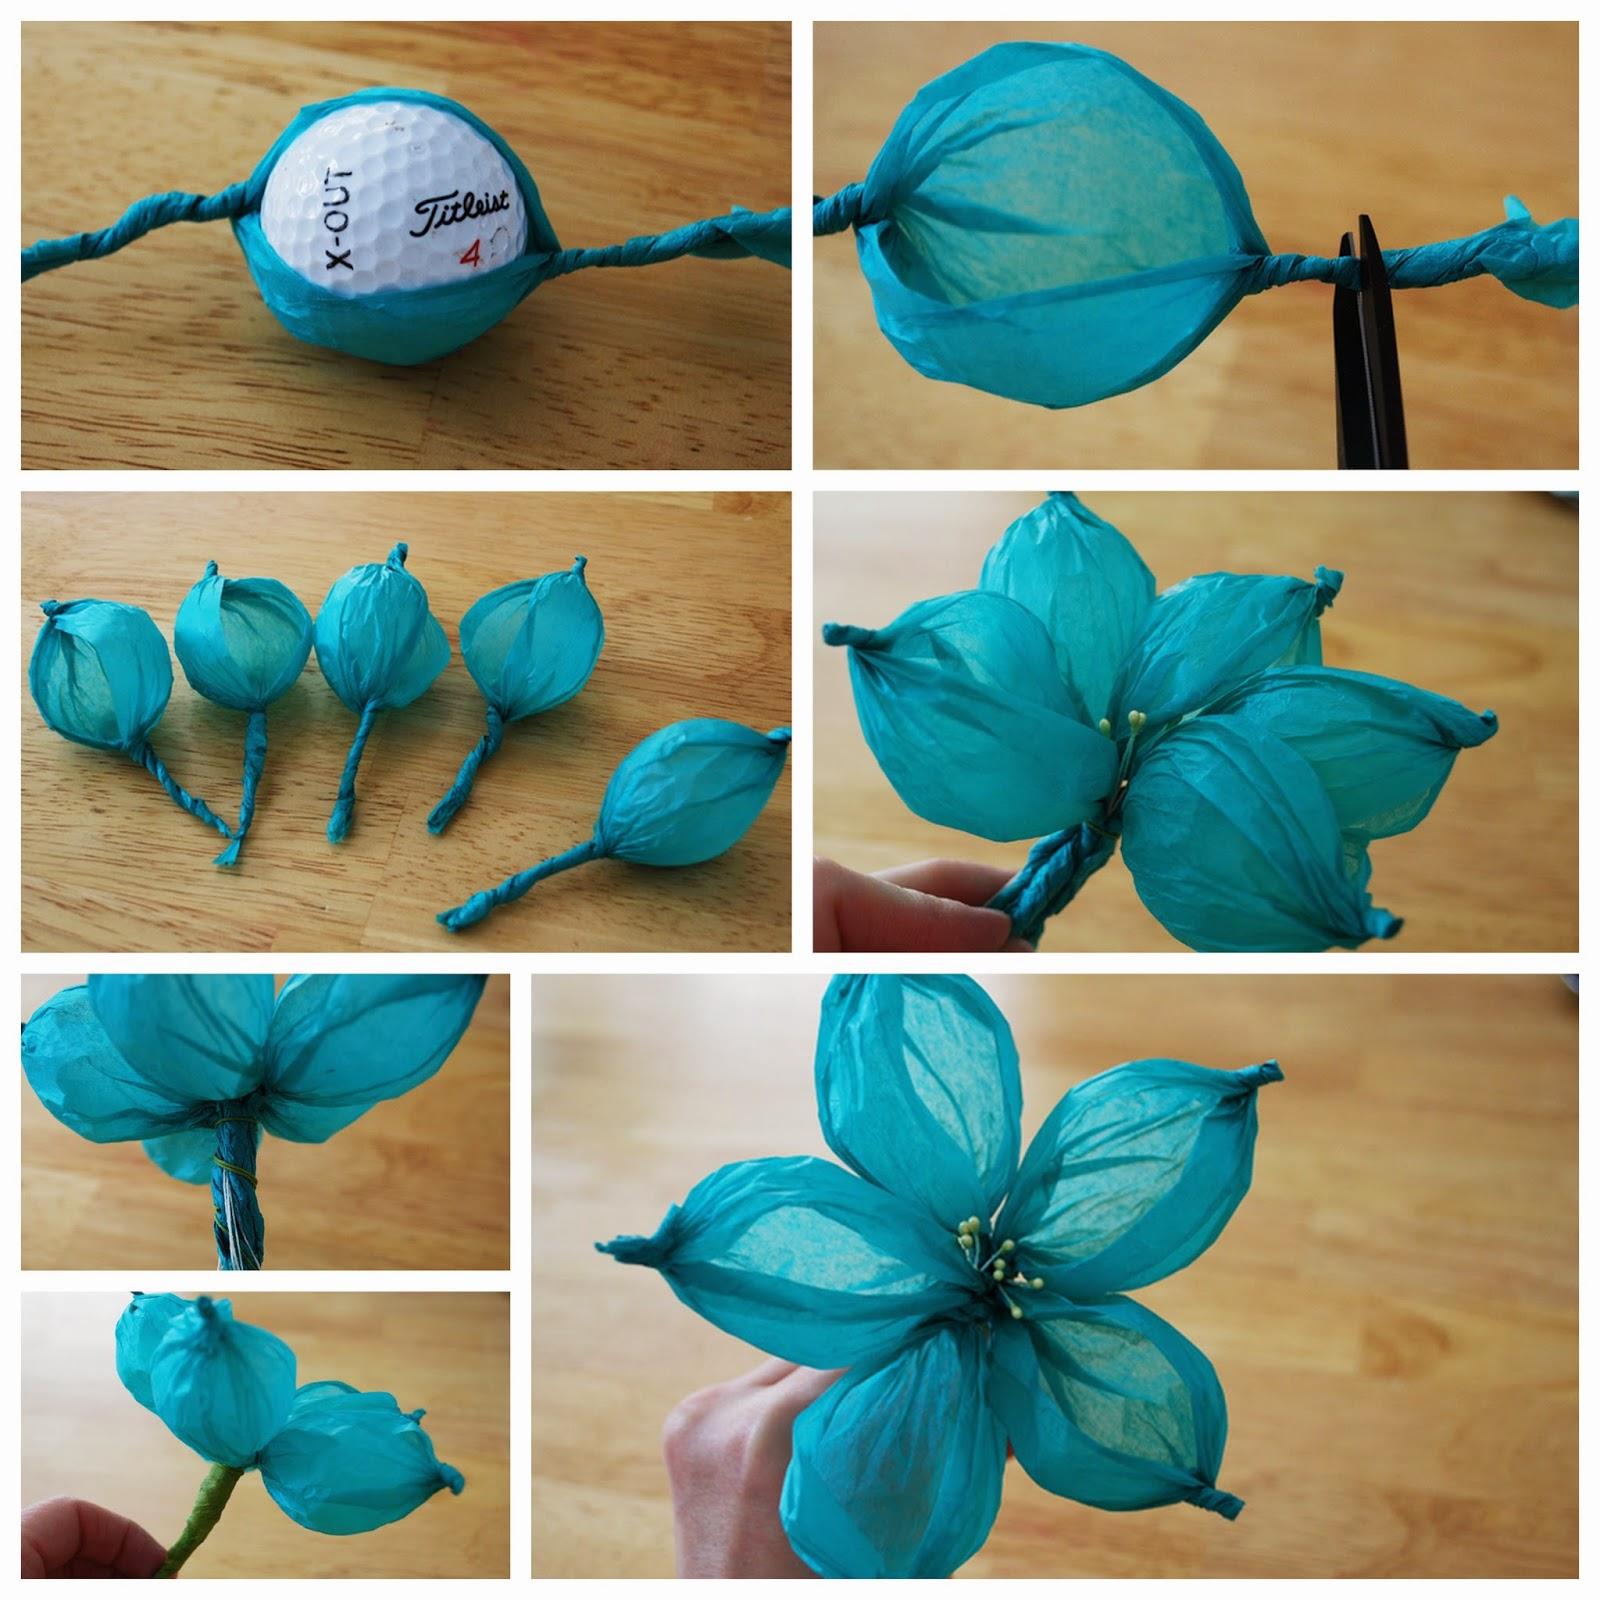 Manualidades con papel hermosa flor de seda un mundo - Manualidades en papel ...